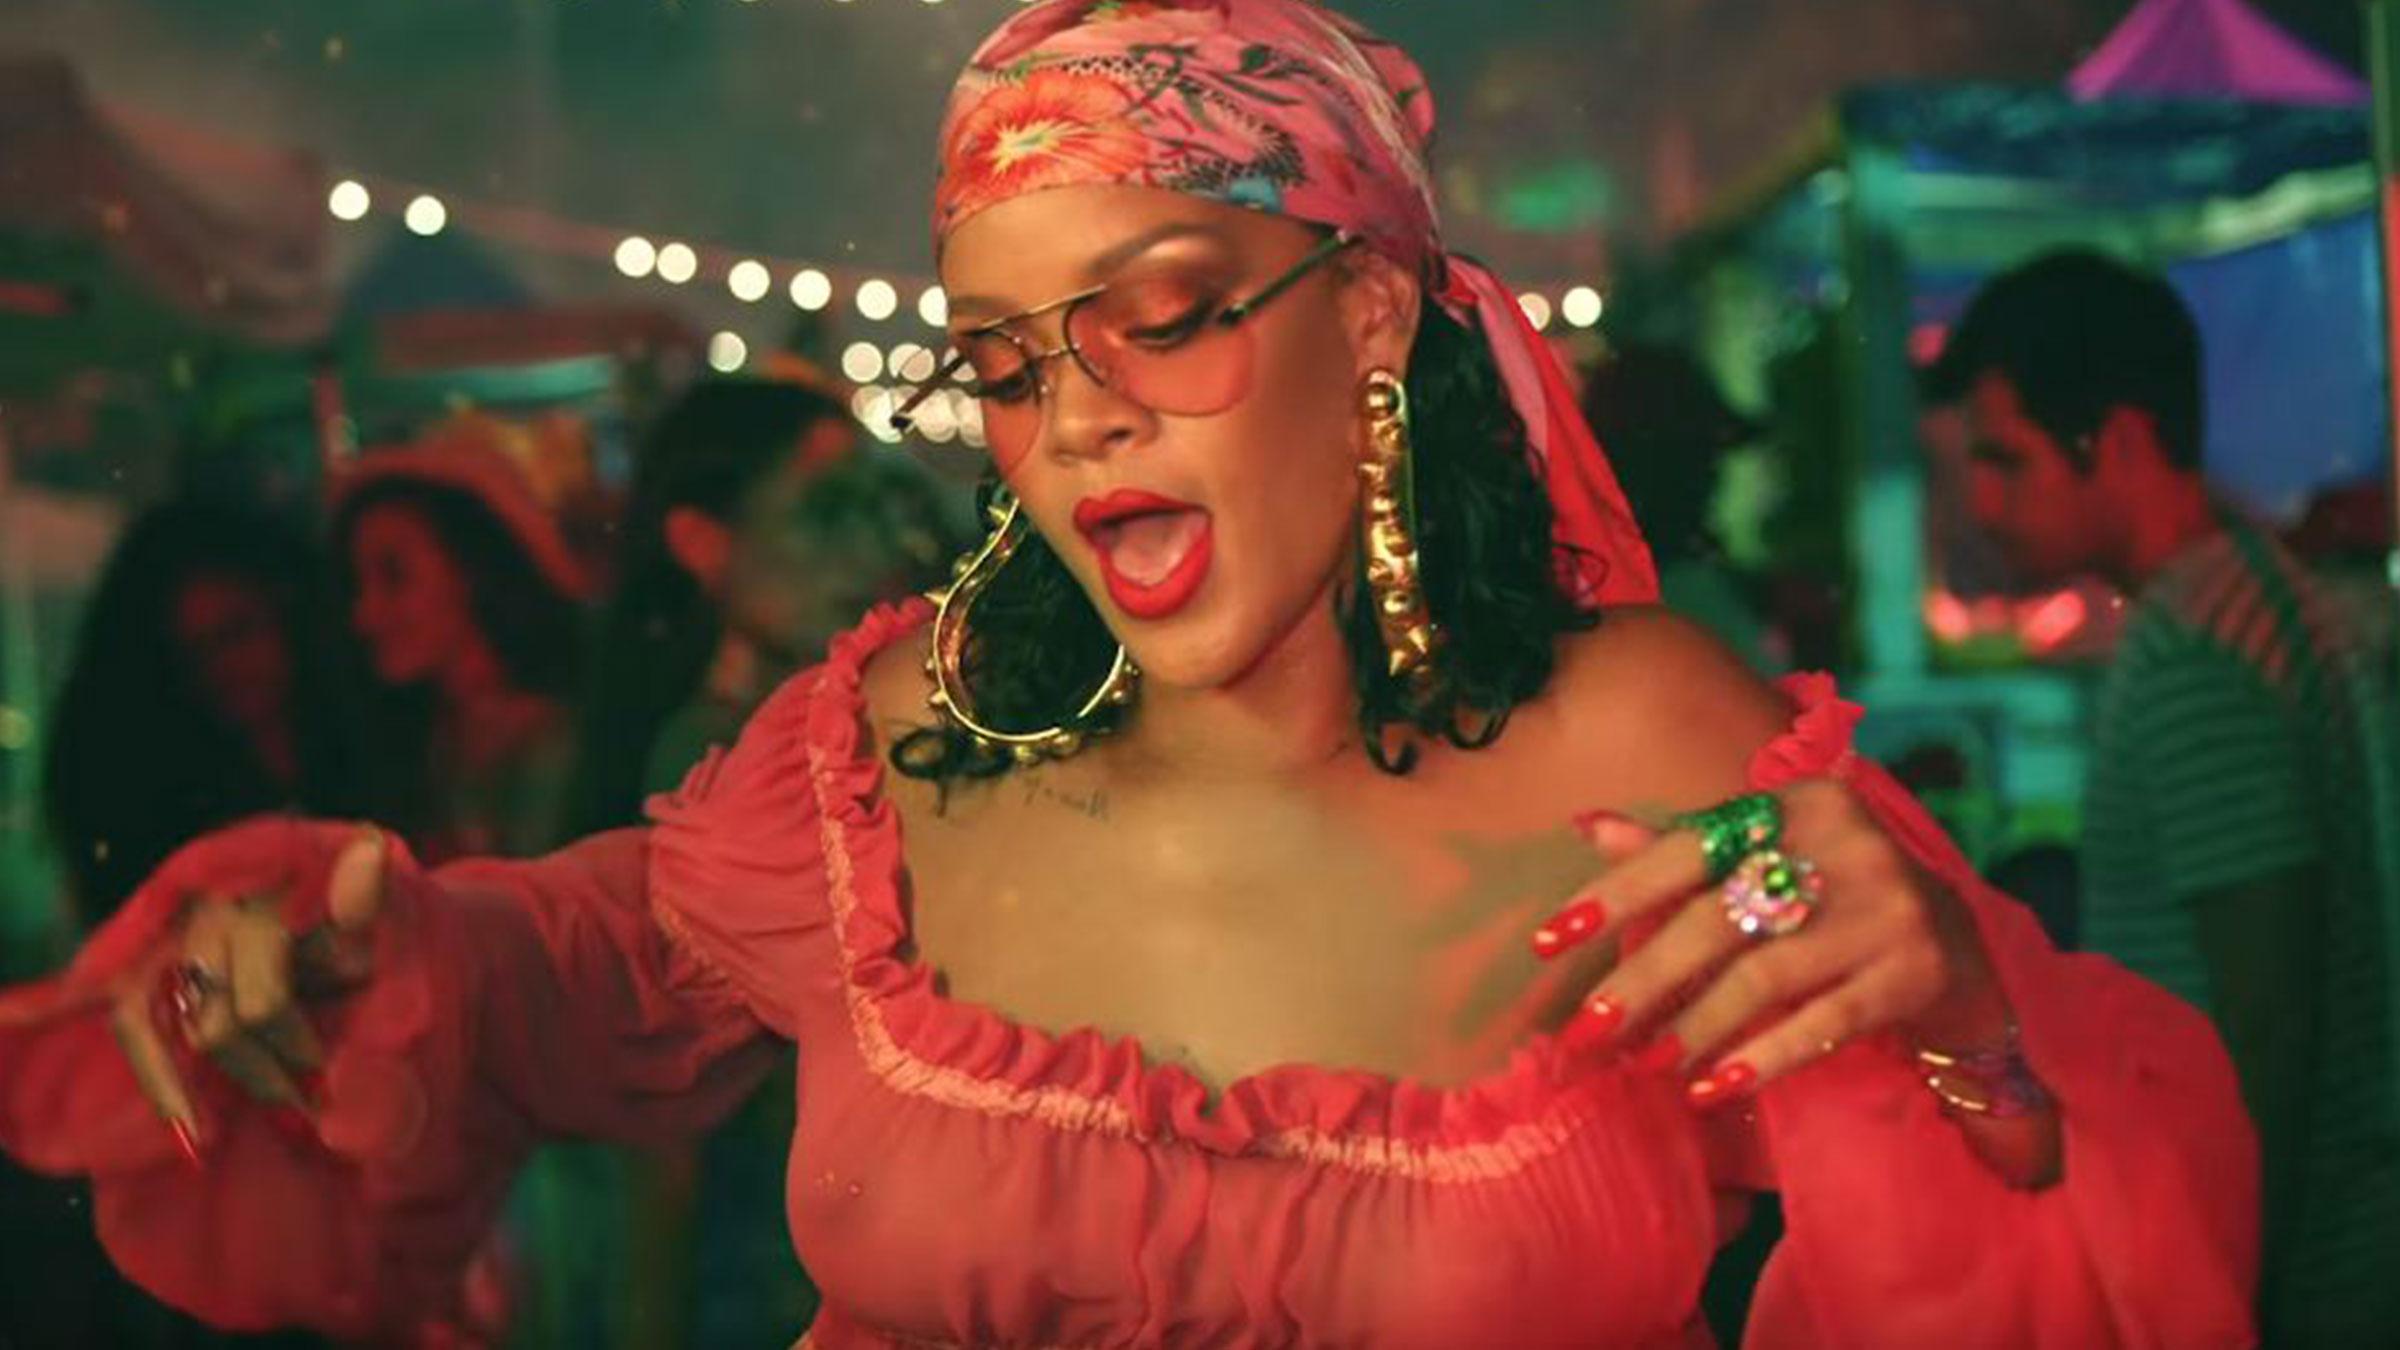 Rihannahomedefkhaled